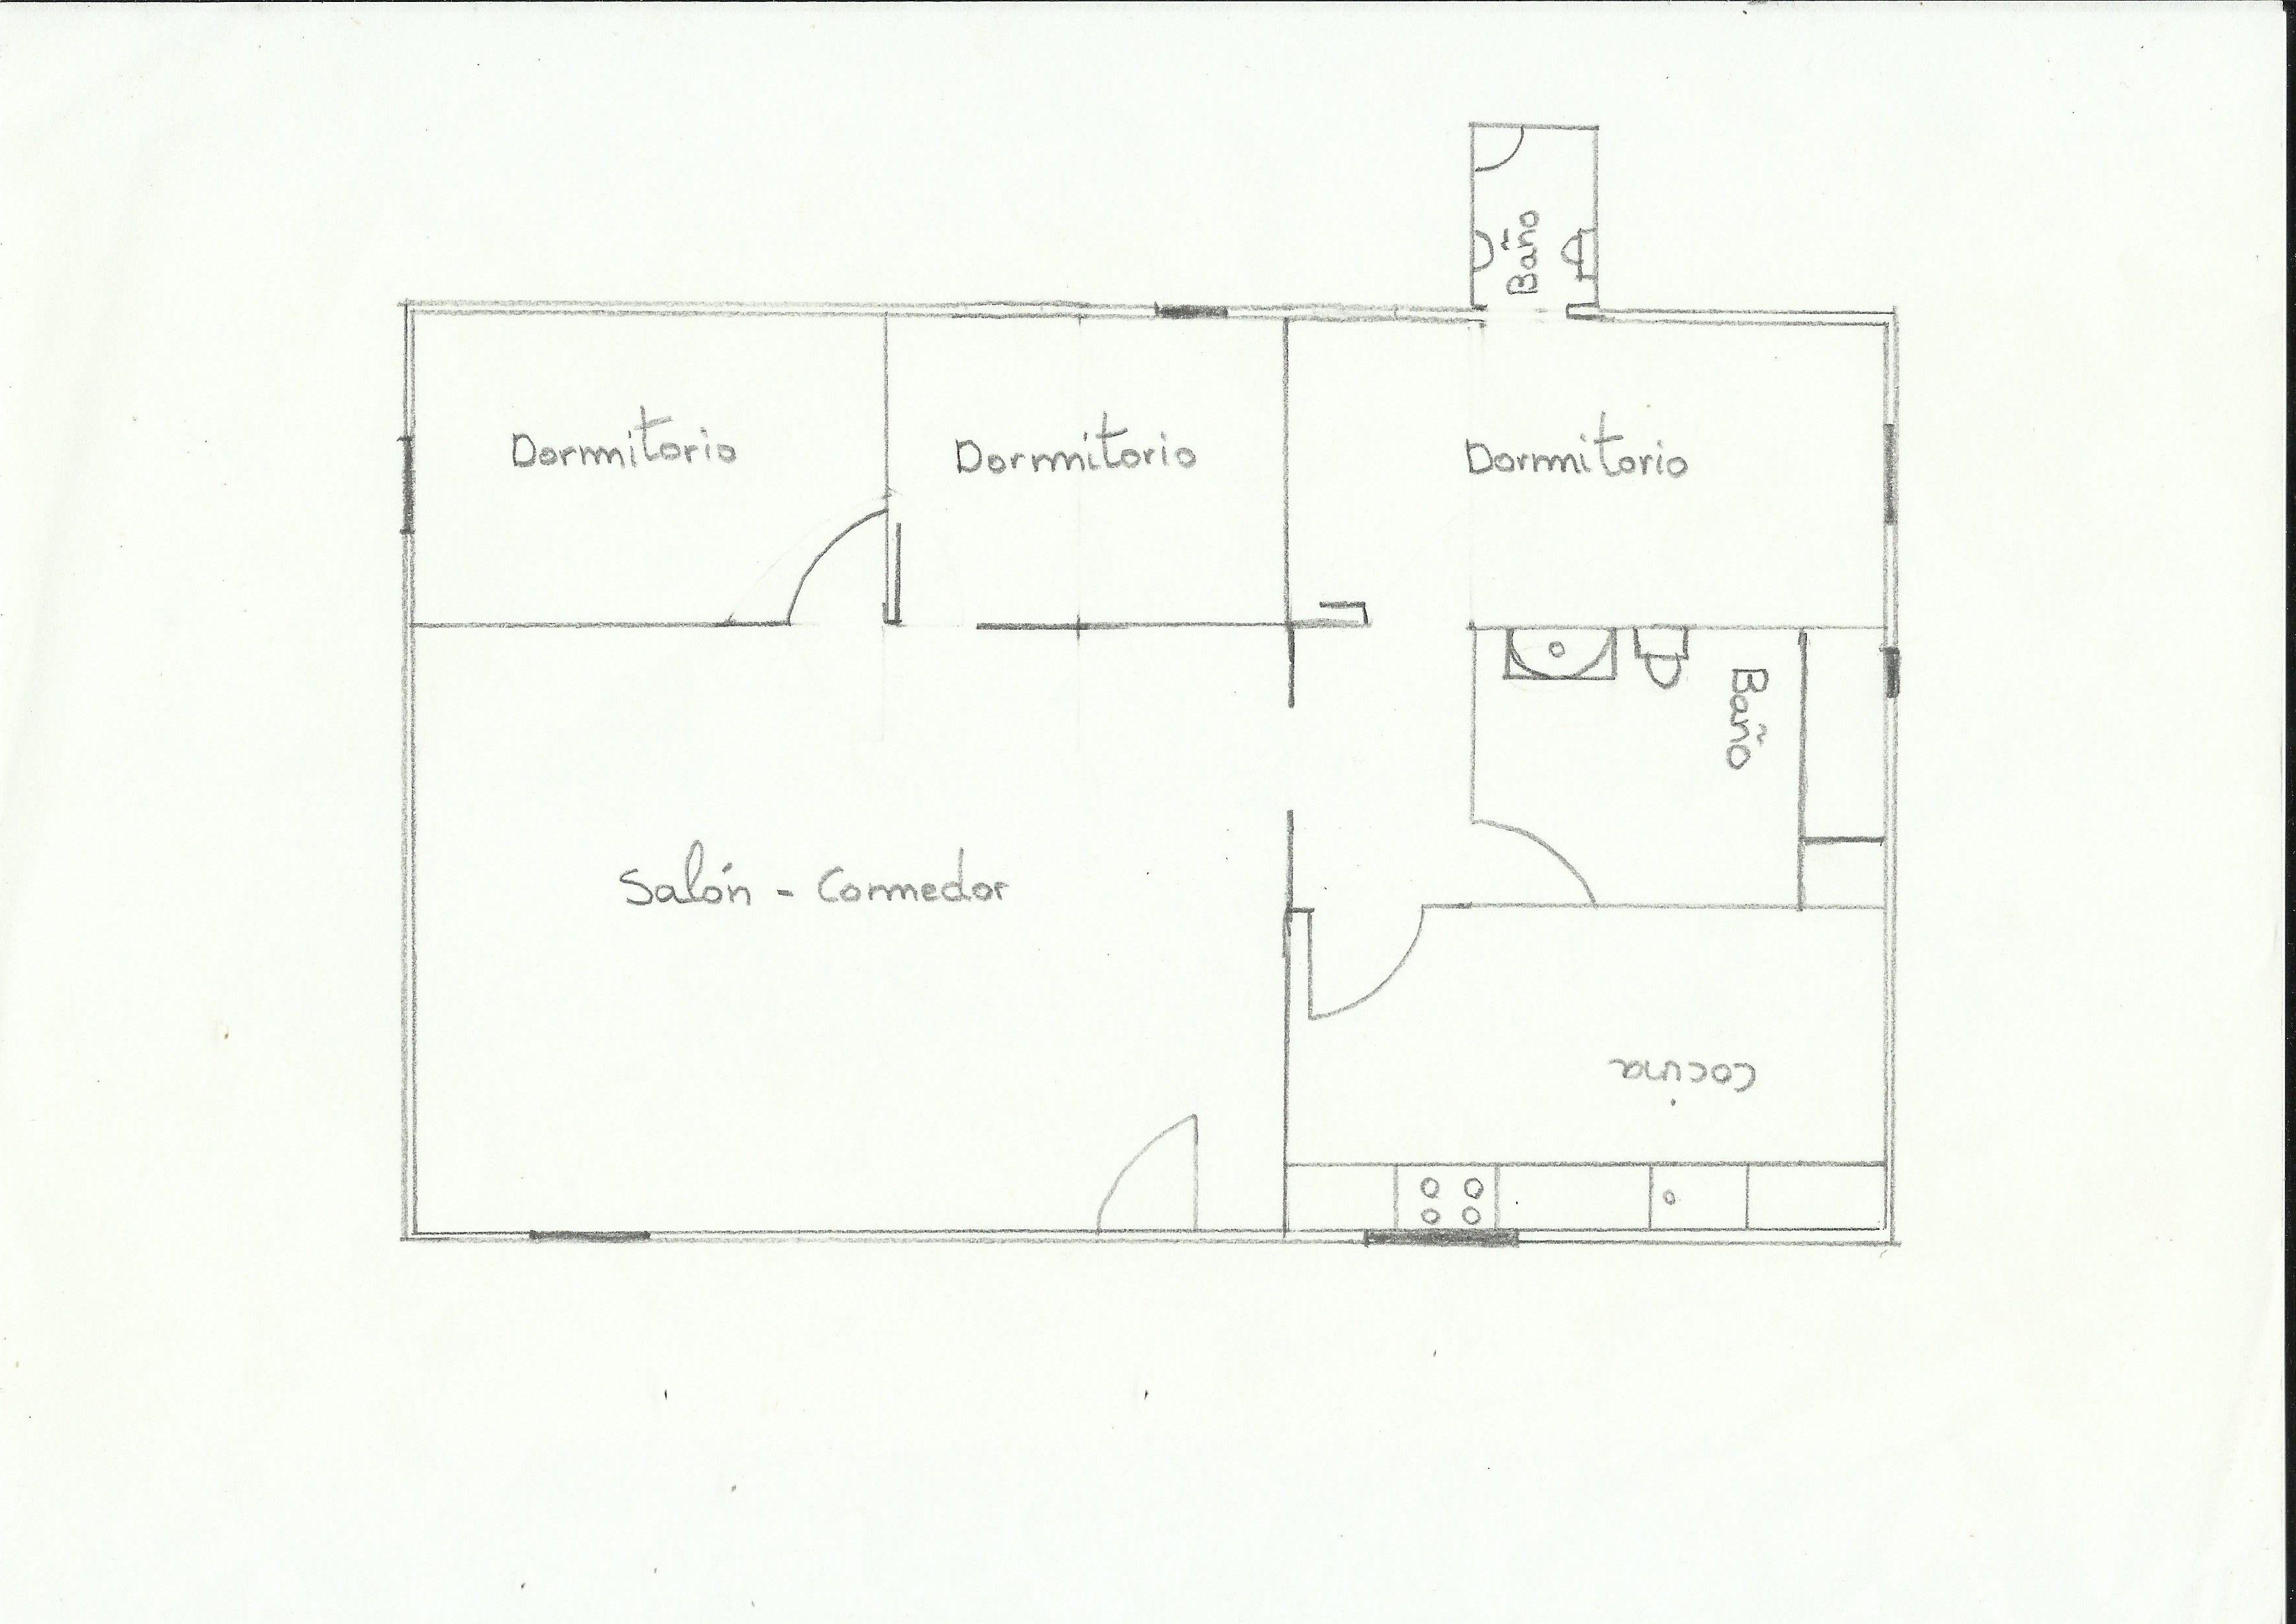 Dibujar plano de la casa bloque i tarea 1 en este for Realizar planos